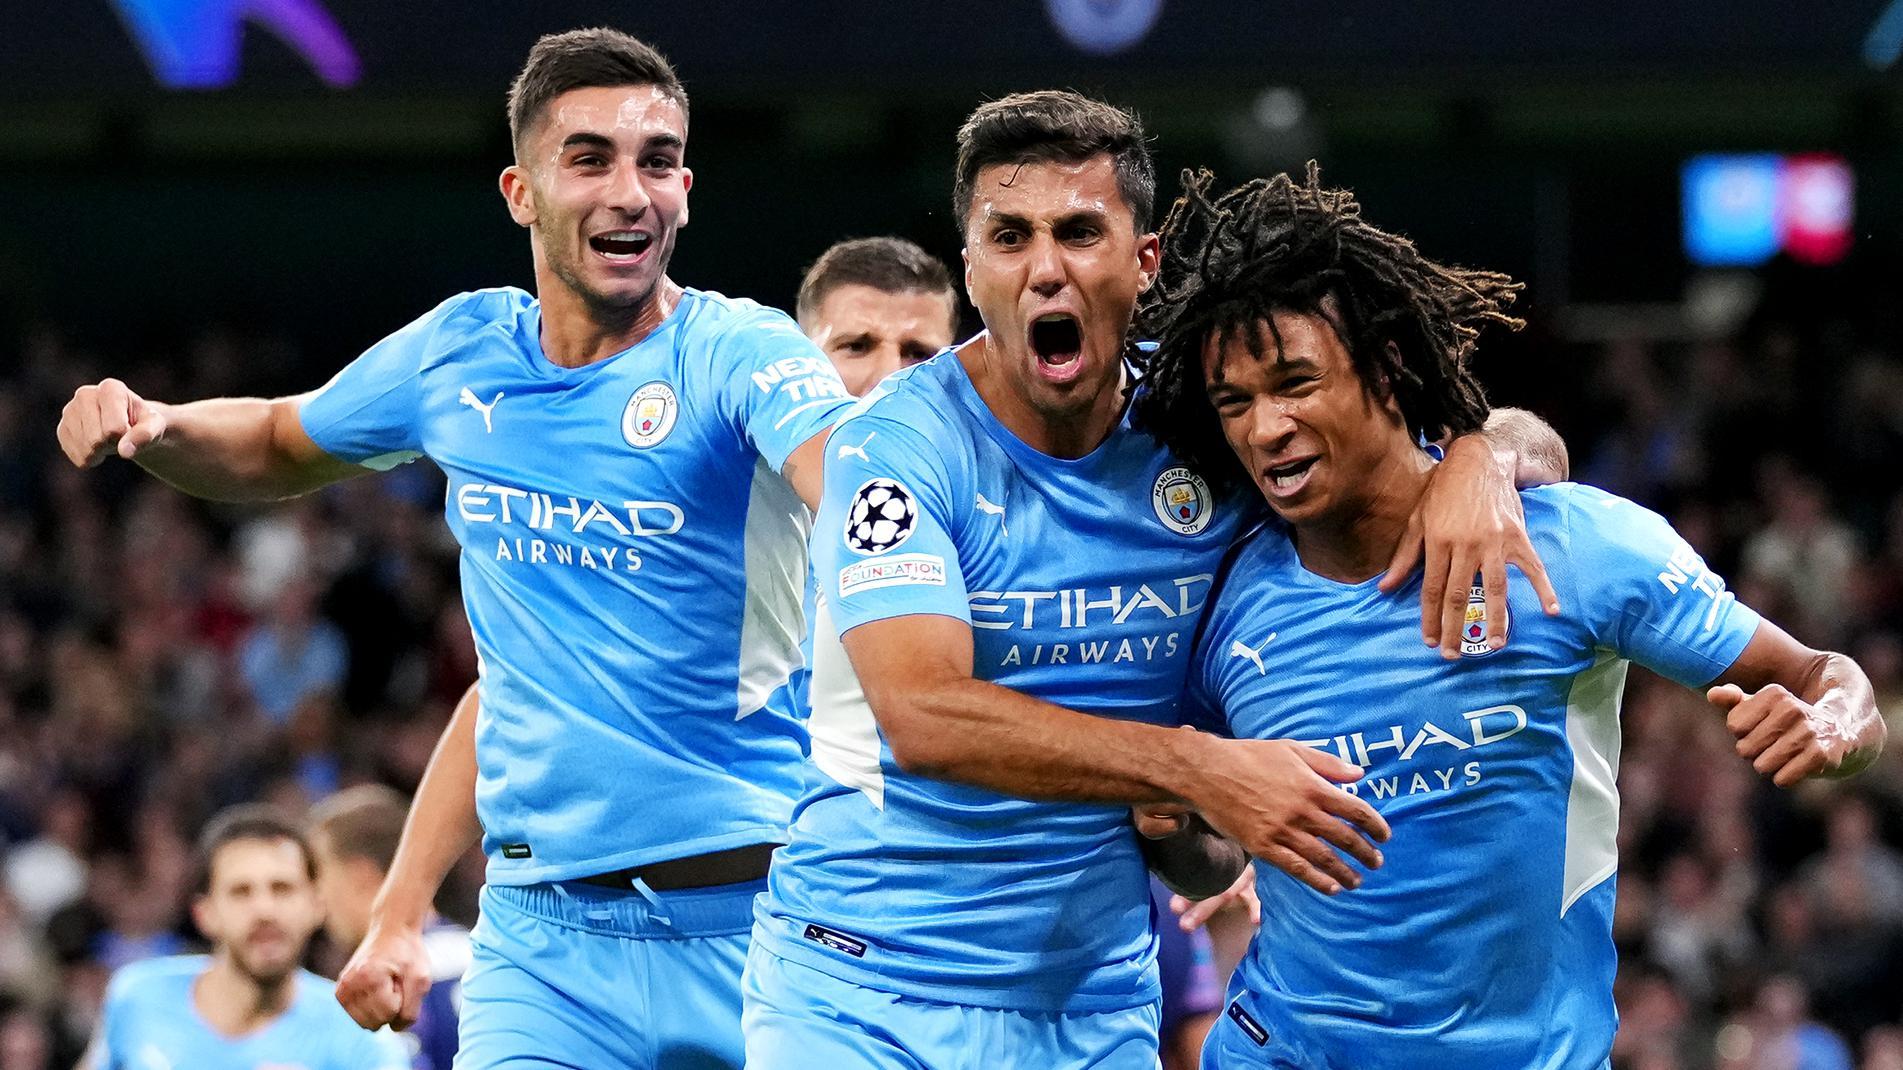 Highlights: City and Liverpool win, Haller runs riot - UEFA.com